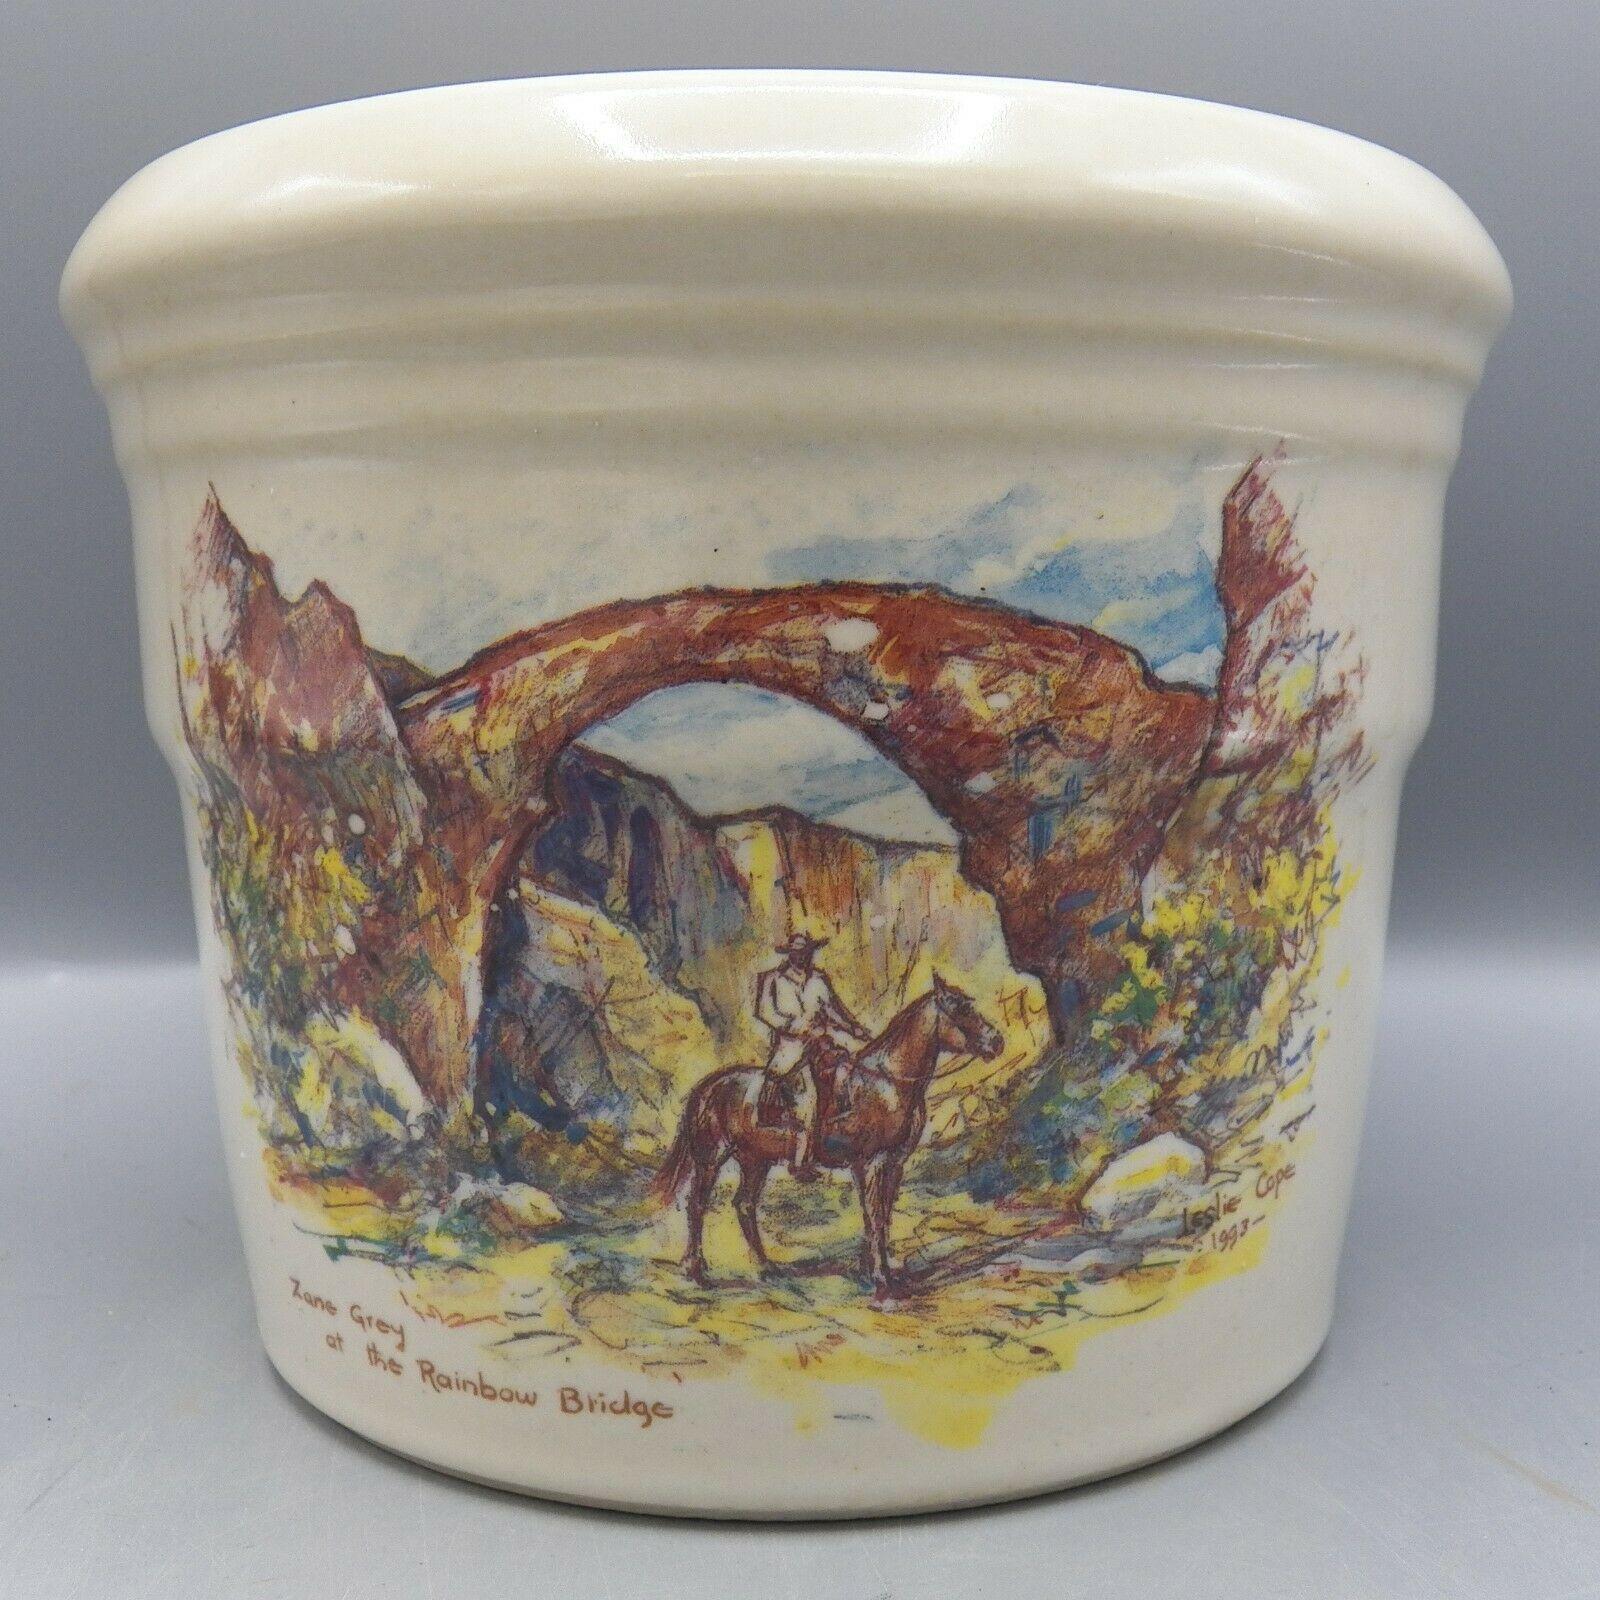 Zanesville Stoneware Zane Grey At Rainbow Bridge Leslie Cope Vase Pot Pottery image 6